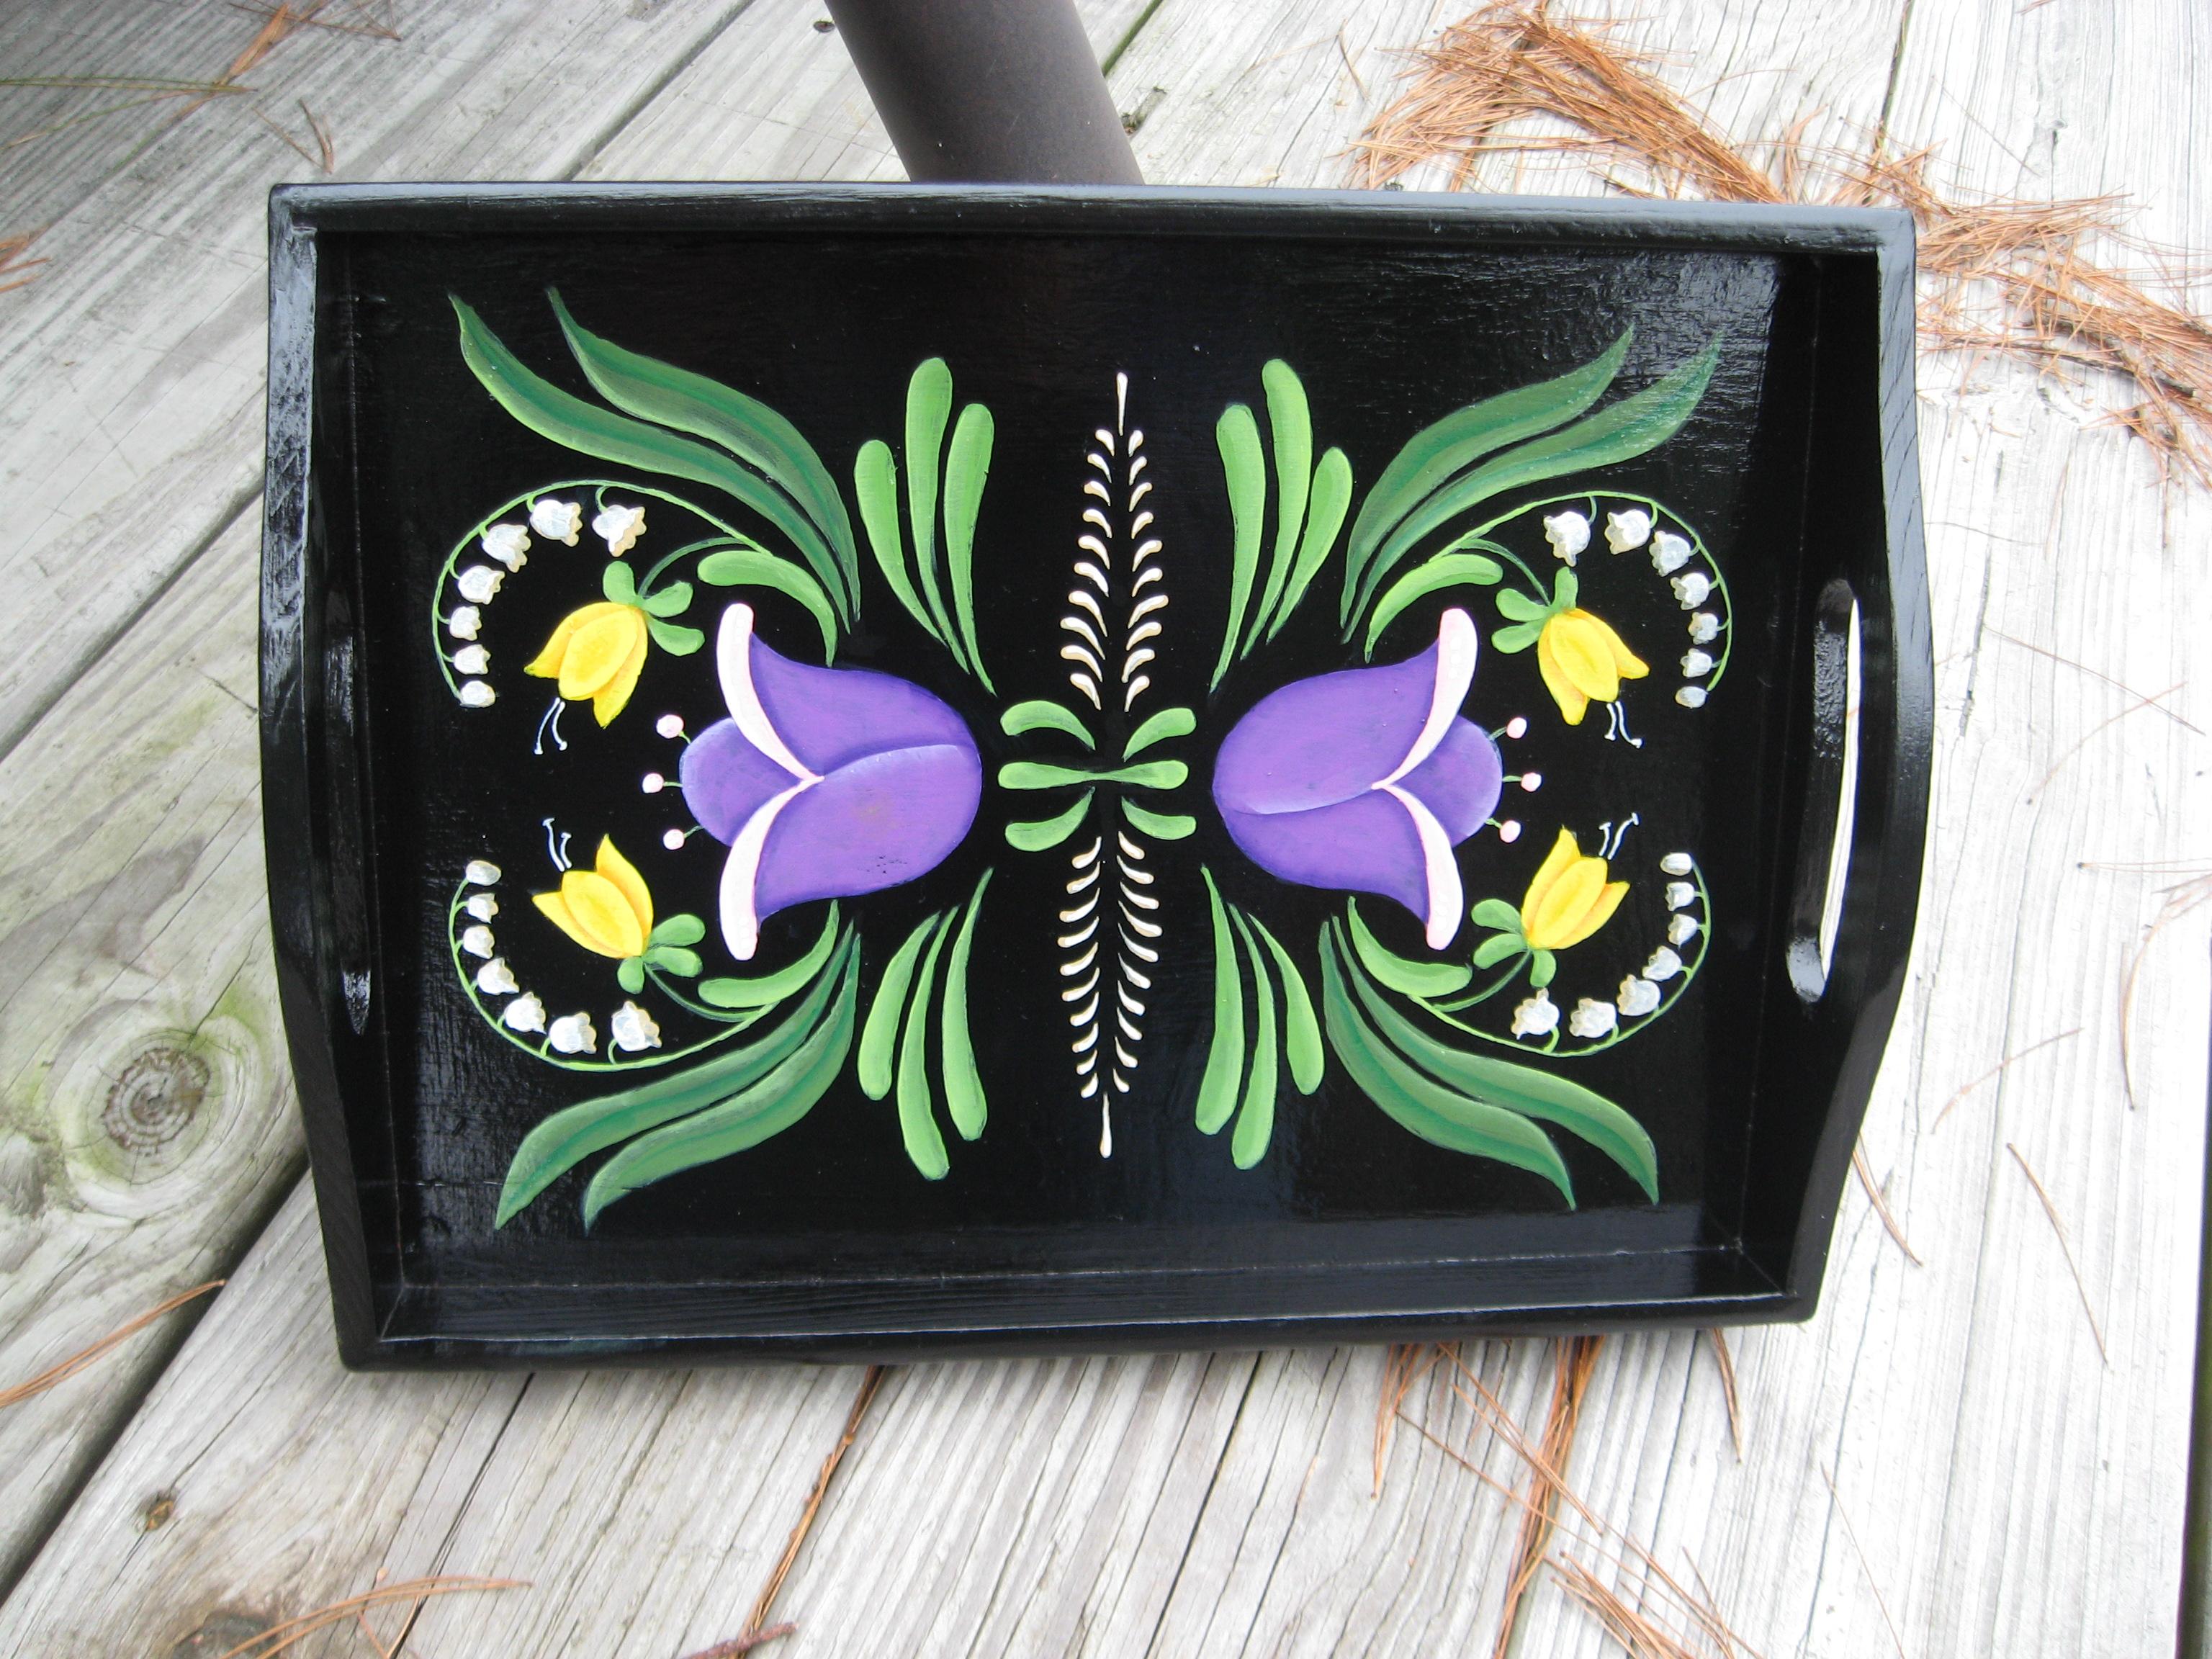 Adirondack folk school - Decorative painting artists ...